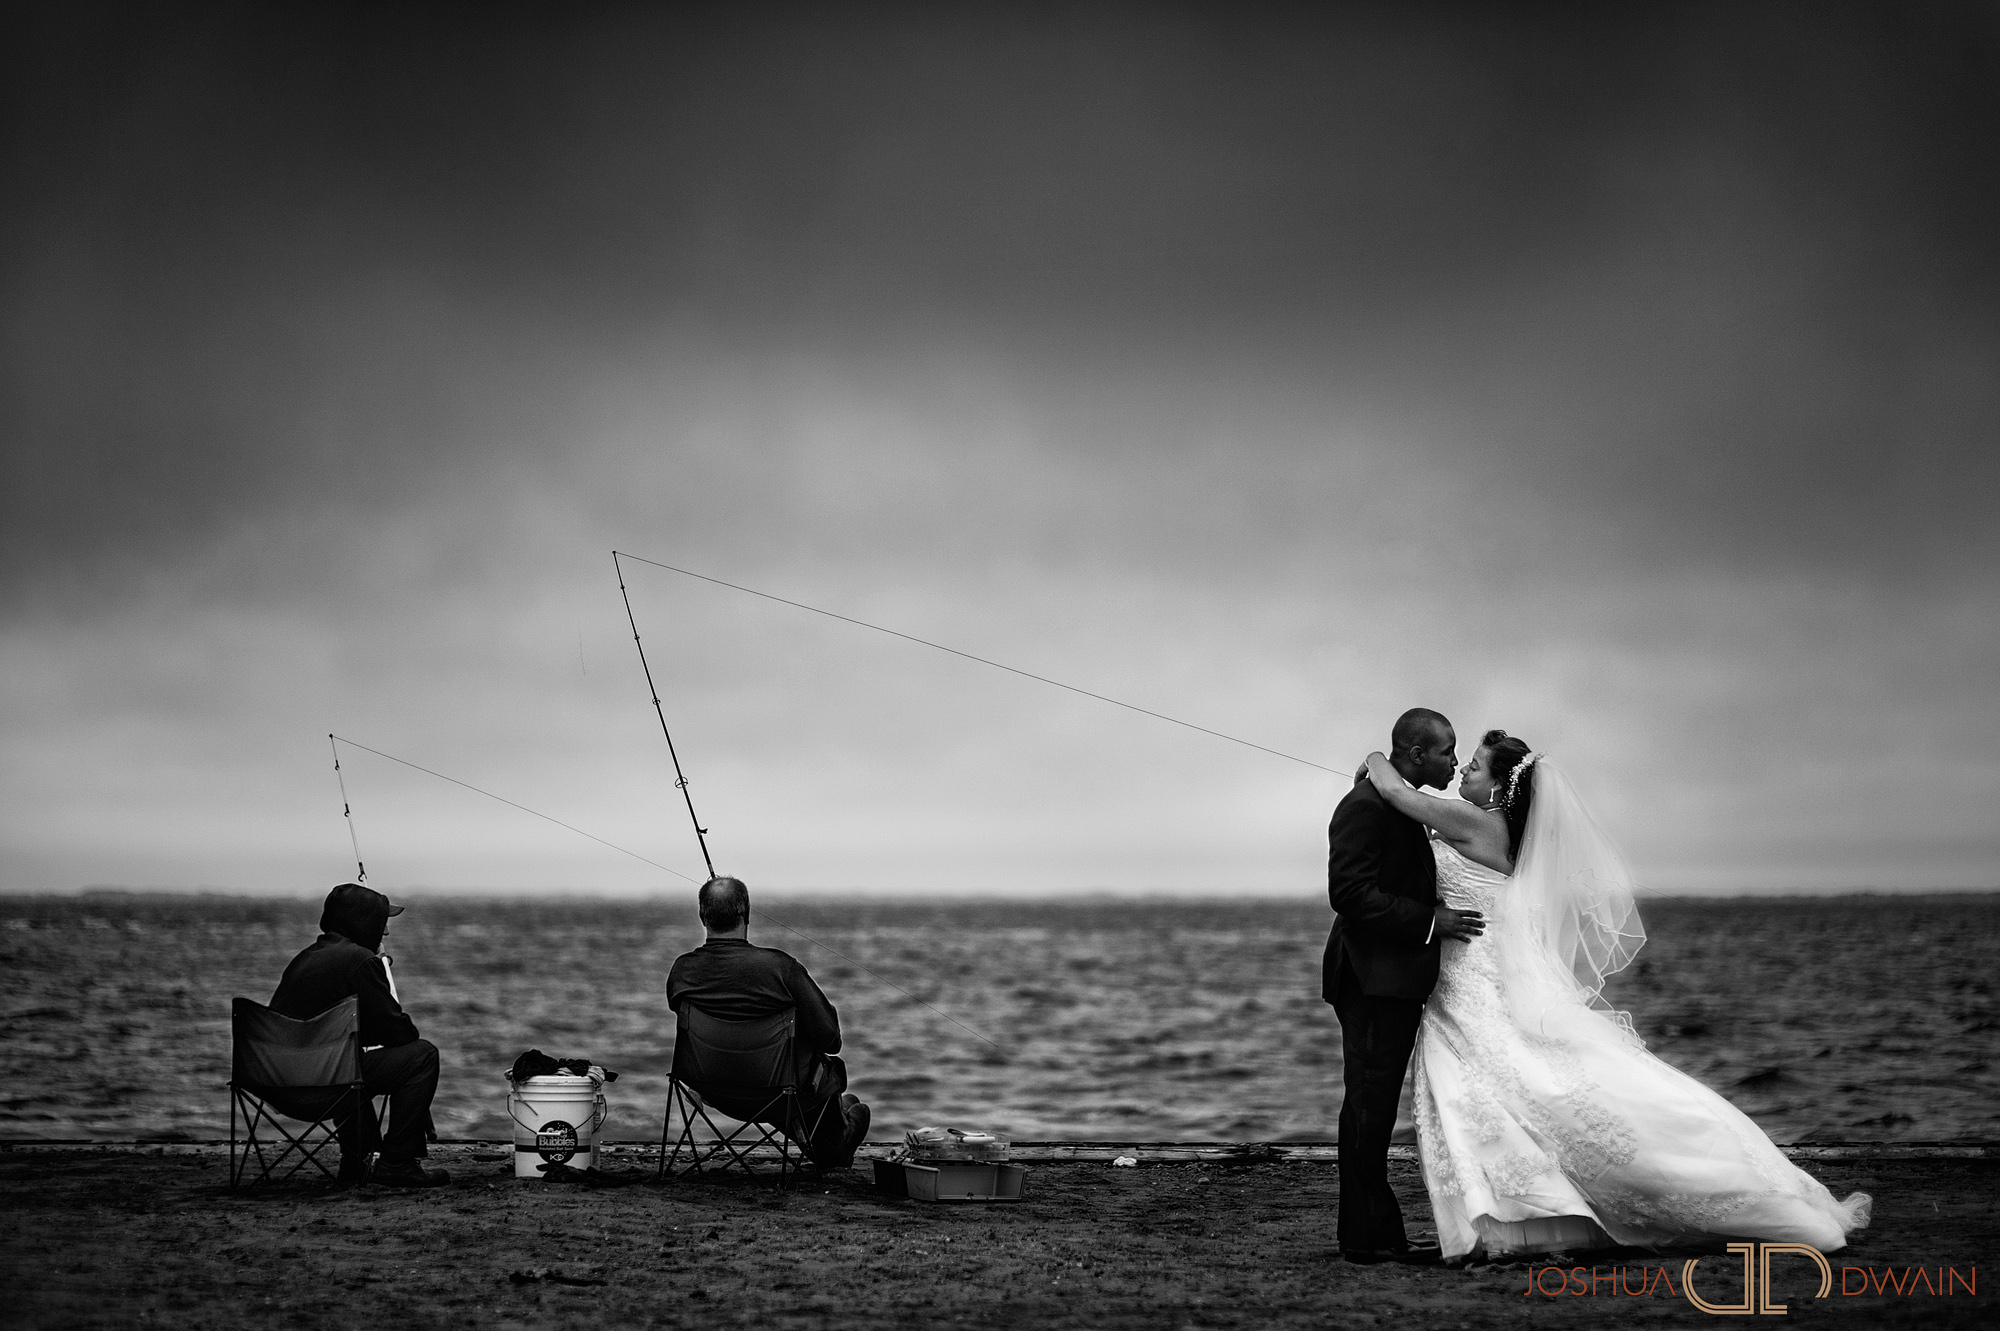 Joshua Dwain Photography Wedding Page Gallery Image